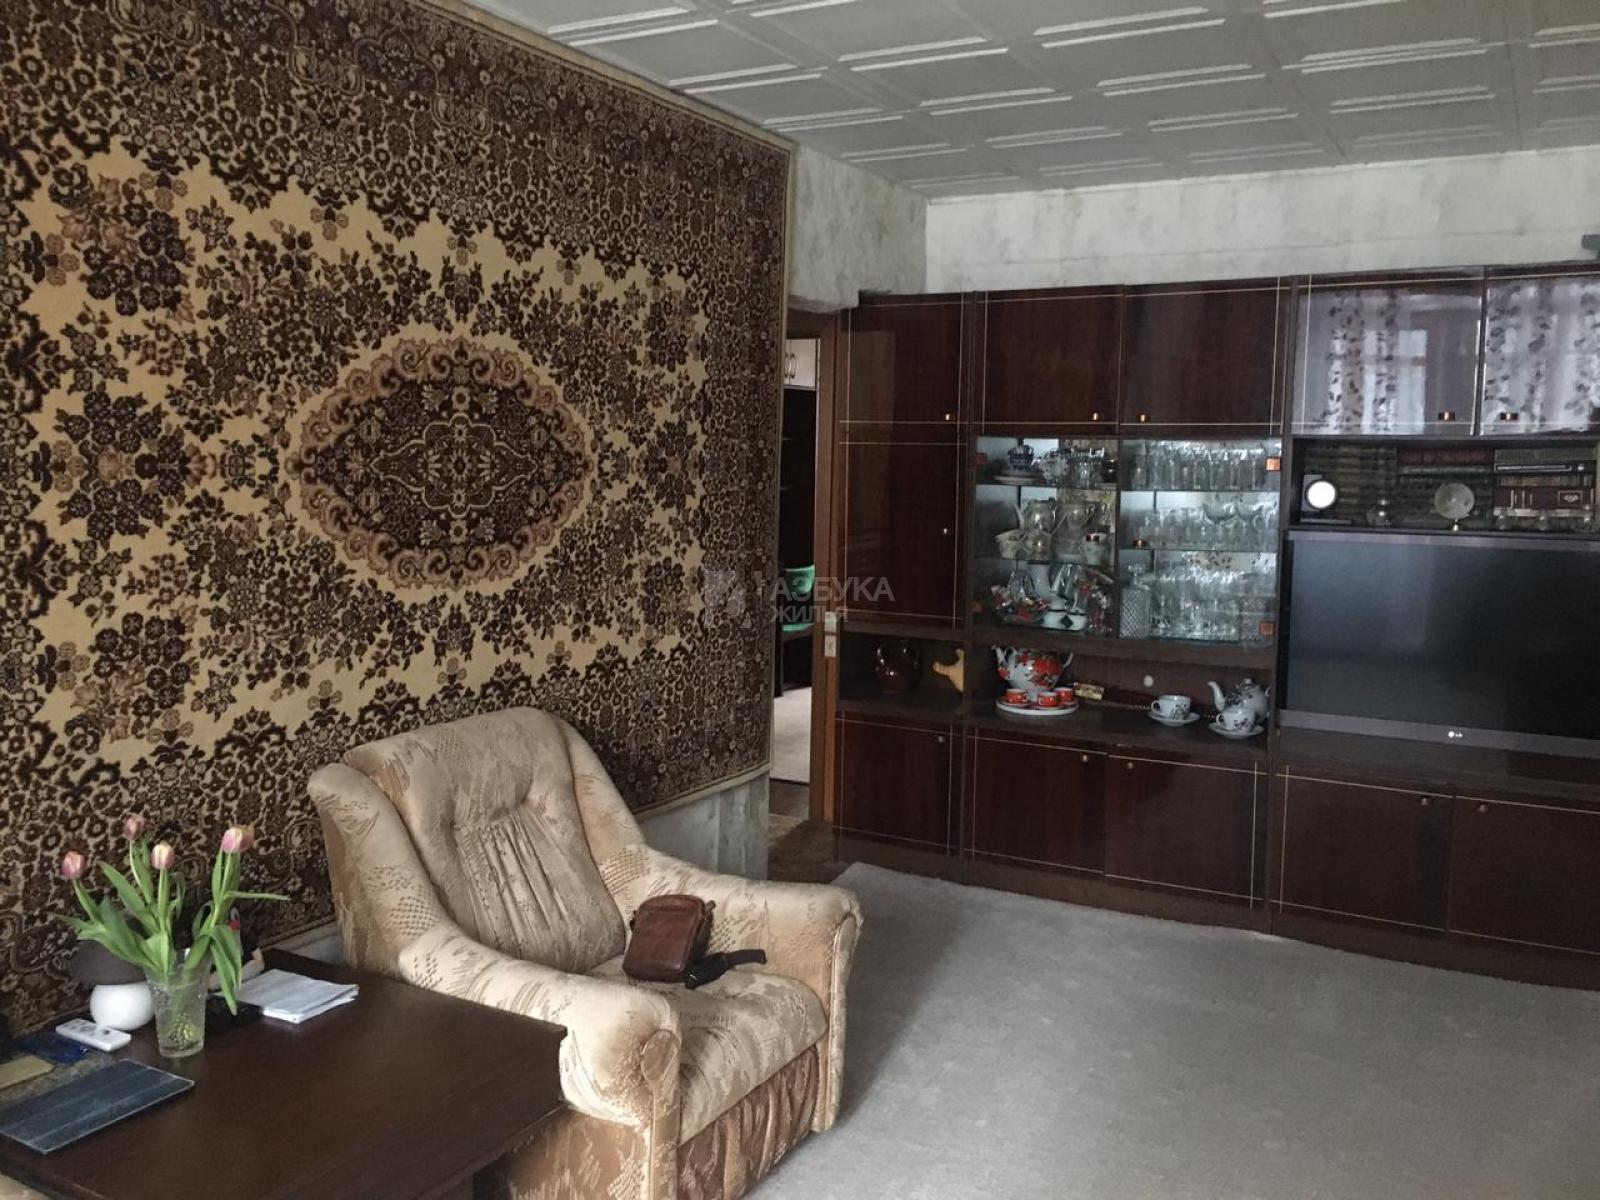 Фото №7 - 3-комнатная квартира, Москва, Солнечногорский проезд 5 корпус 1, метро Беломорская